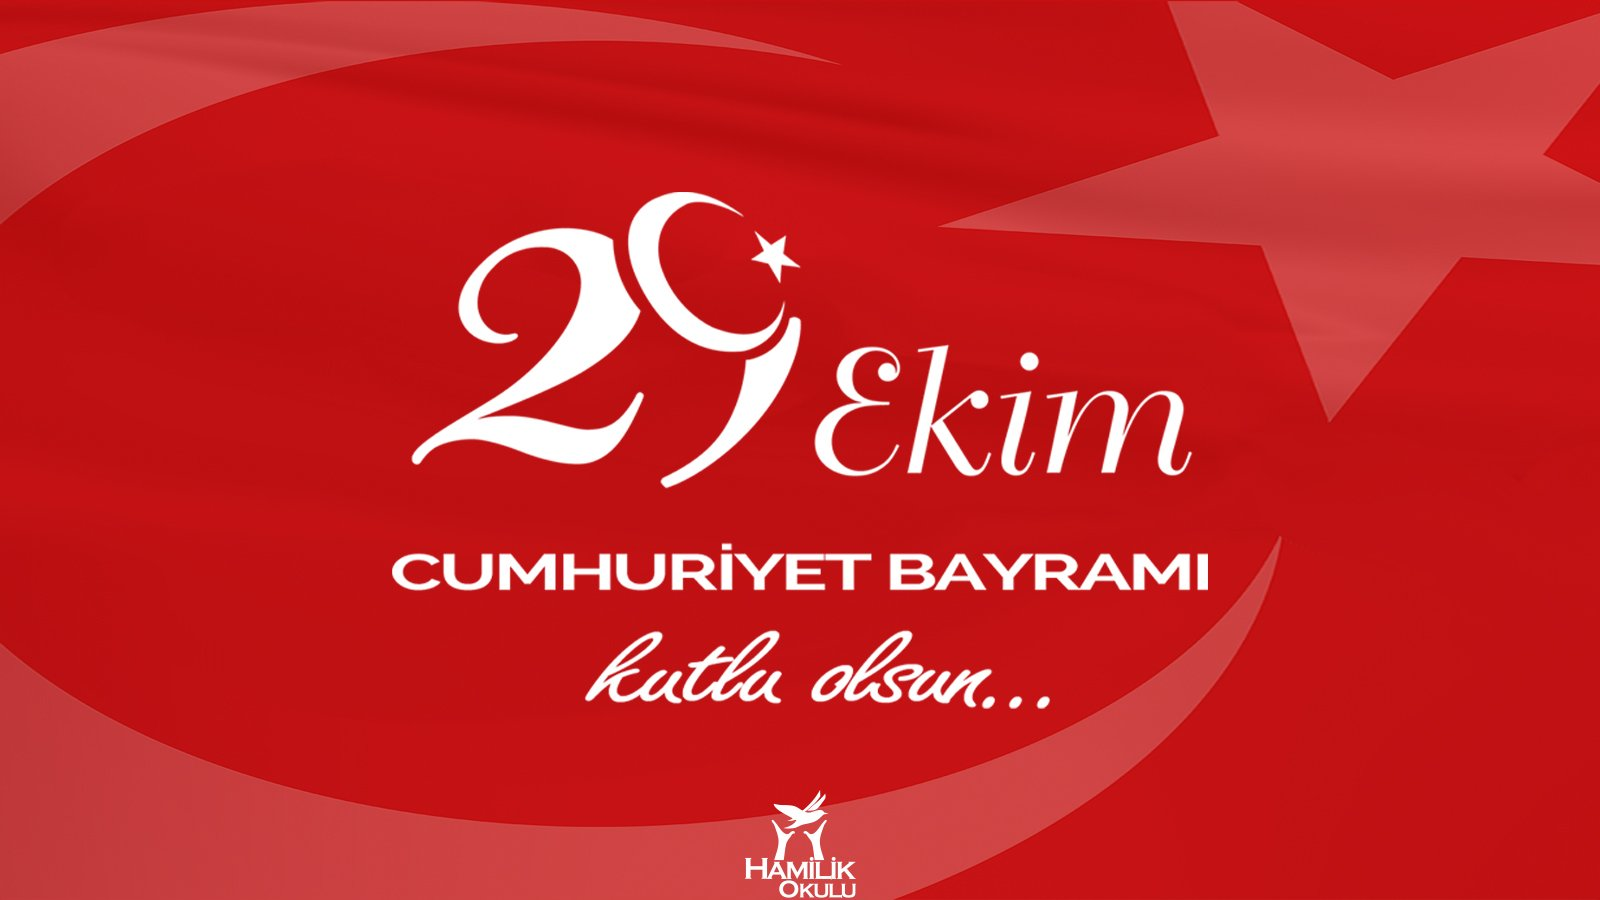 29 Ekim Cumhuriyet Bayramı Kutlu Olsun! post thumbnail